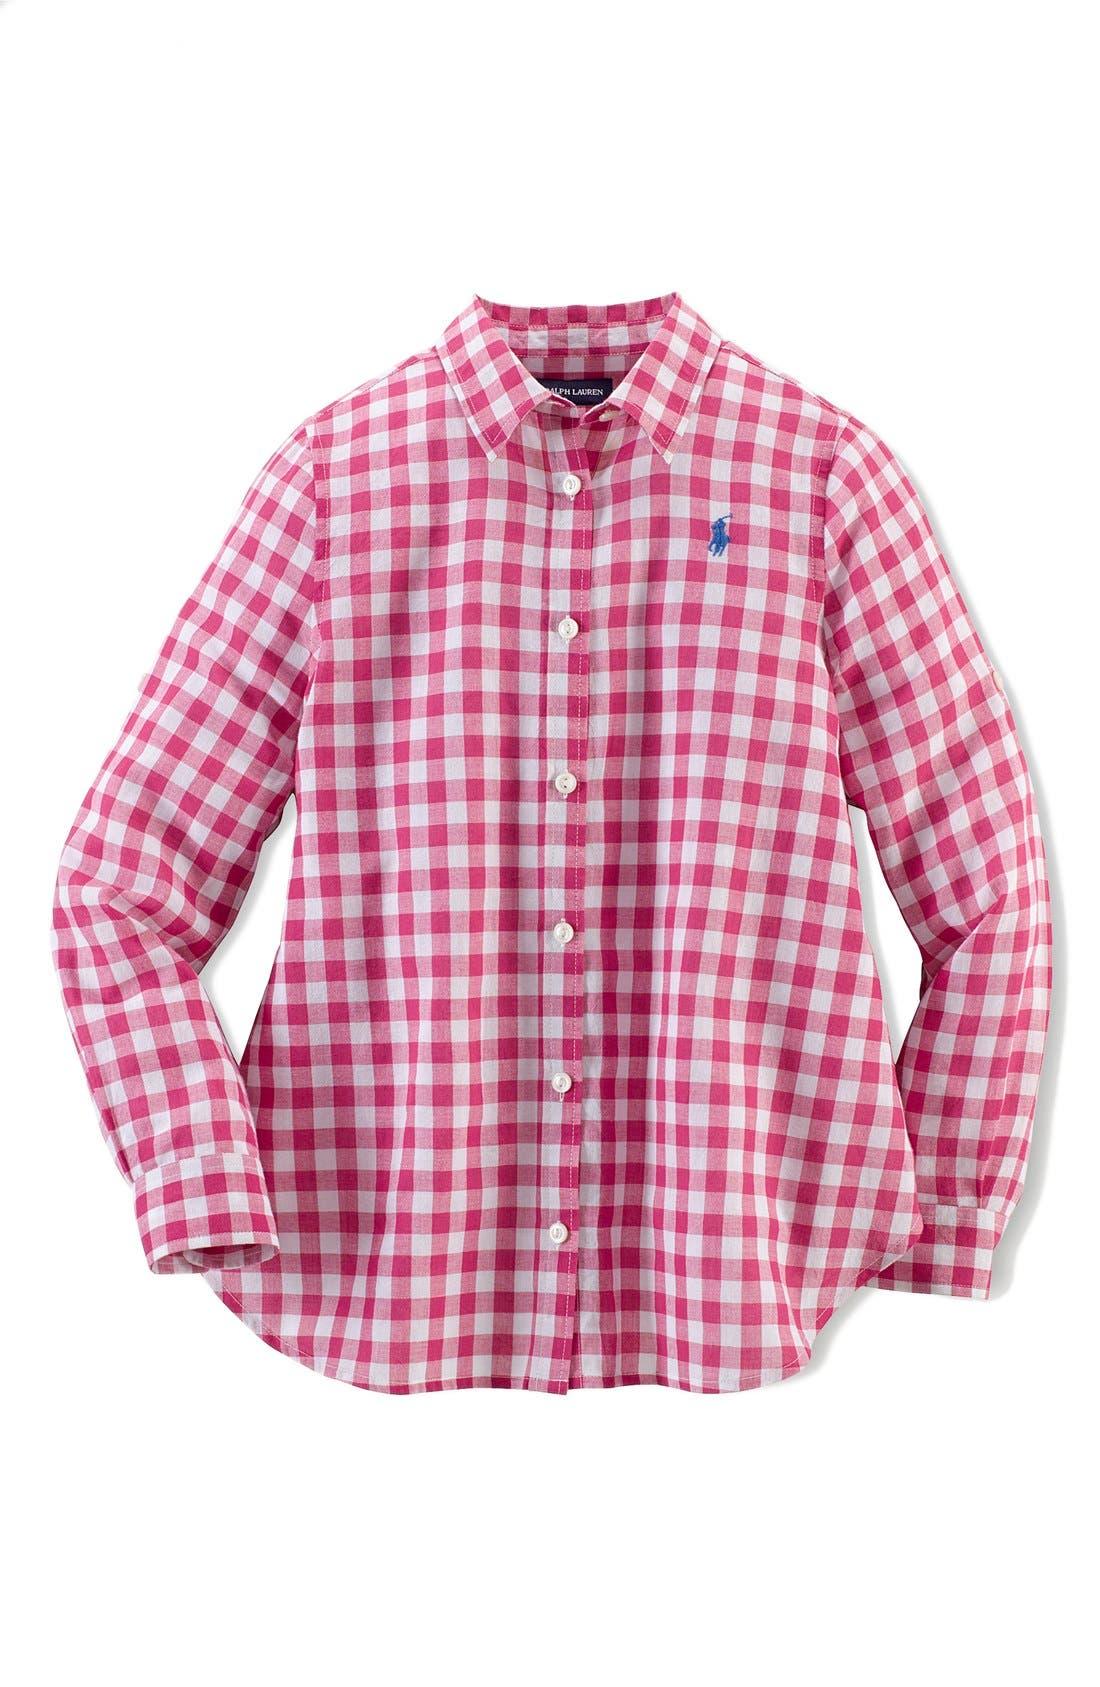 Main Image - Ralph Lauren Gingham Cotton Gauze Shirt (Big Girls)